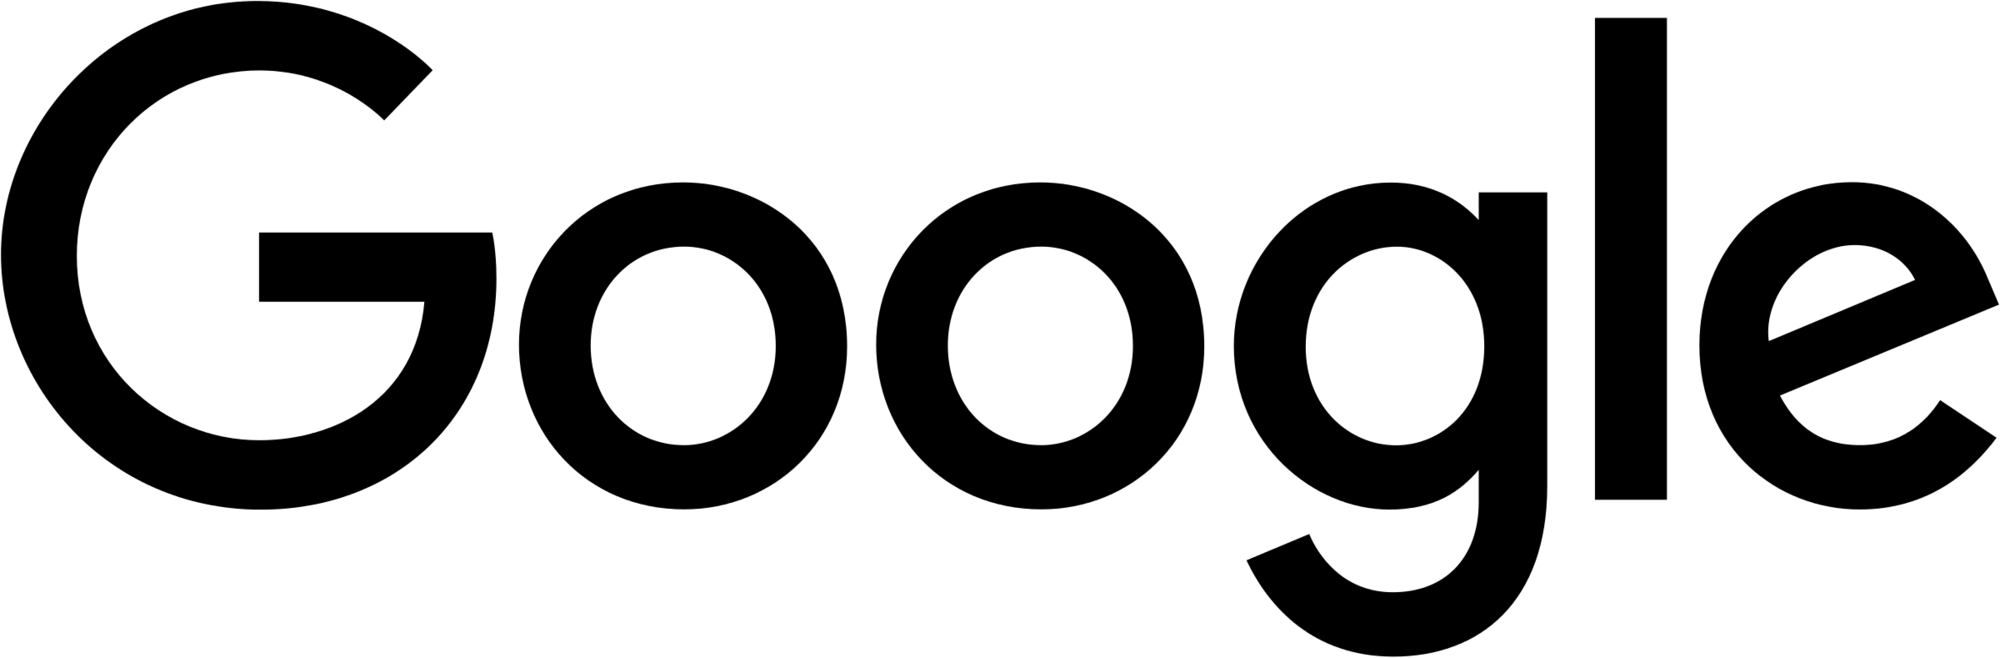 Google-PNG-Image-12887.png